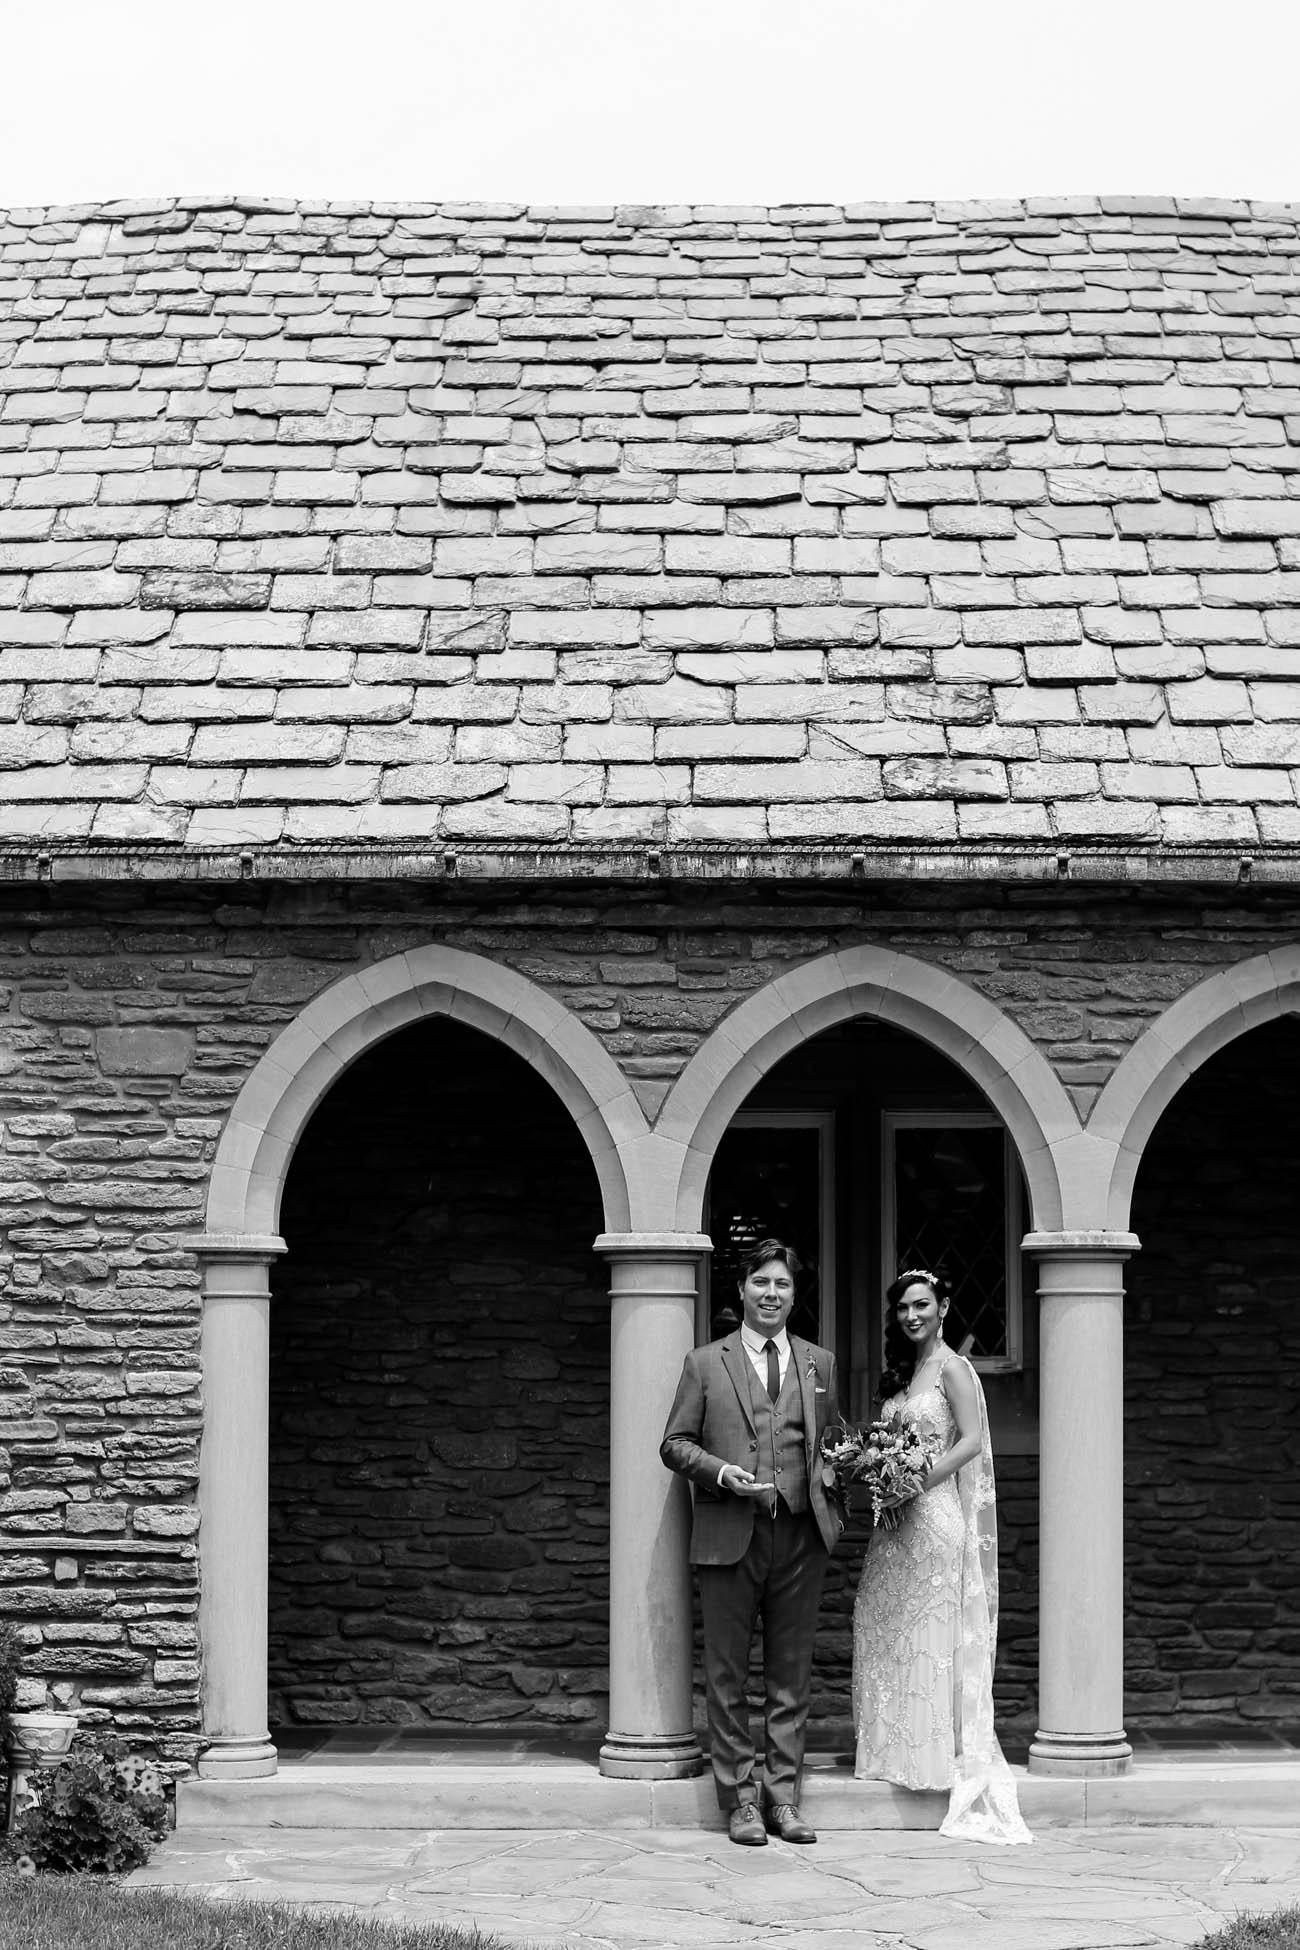 Speakeasy-1920s-theme-Louisville-and-Lexington Wedding-52.jpg